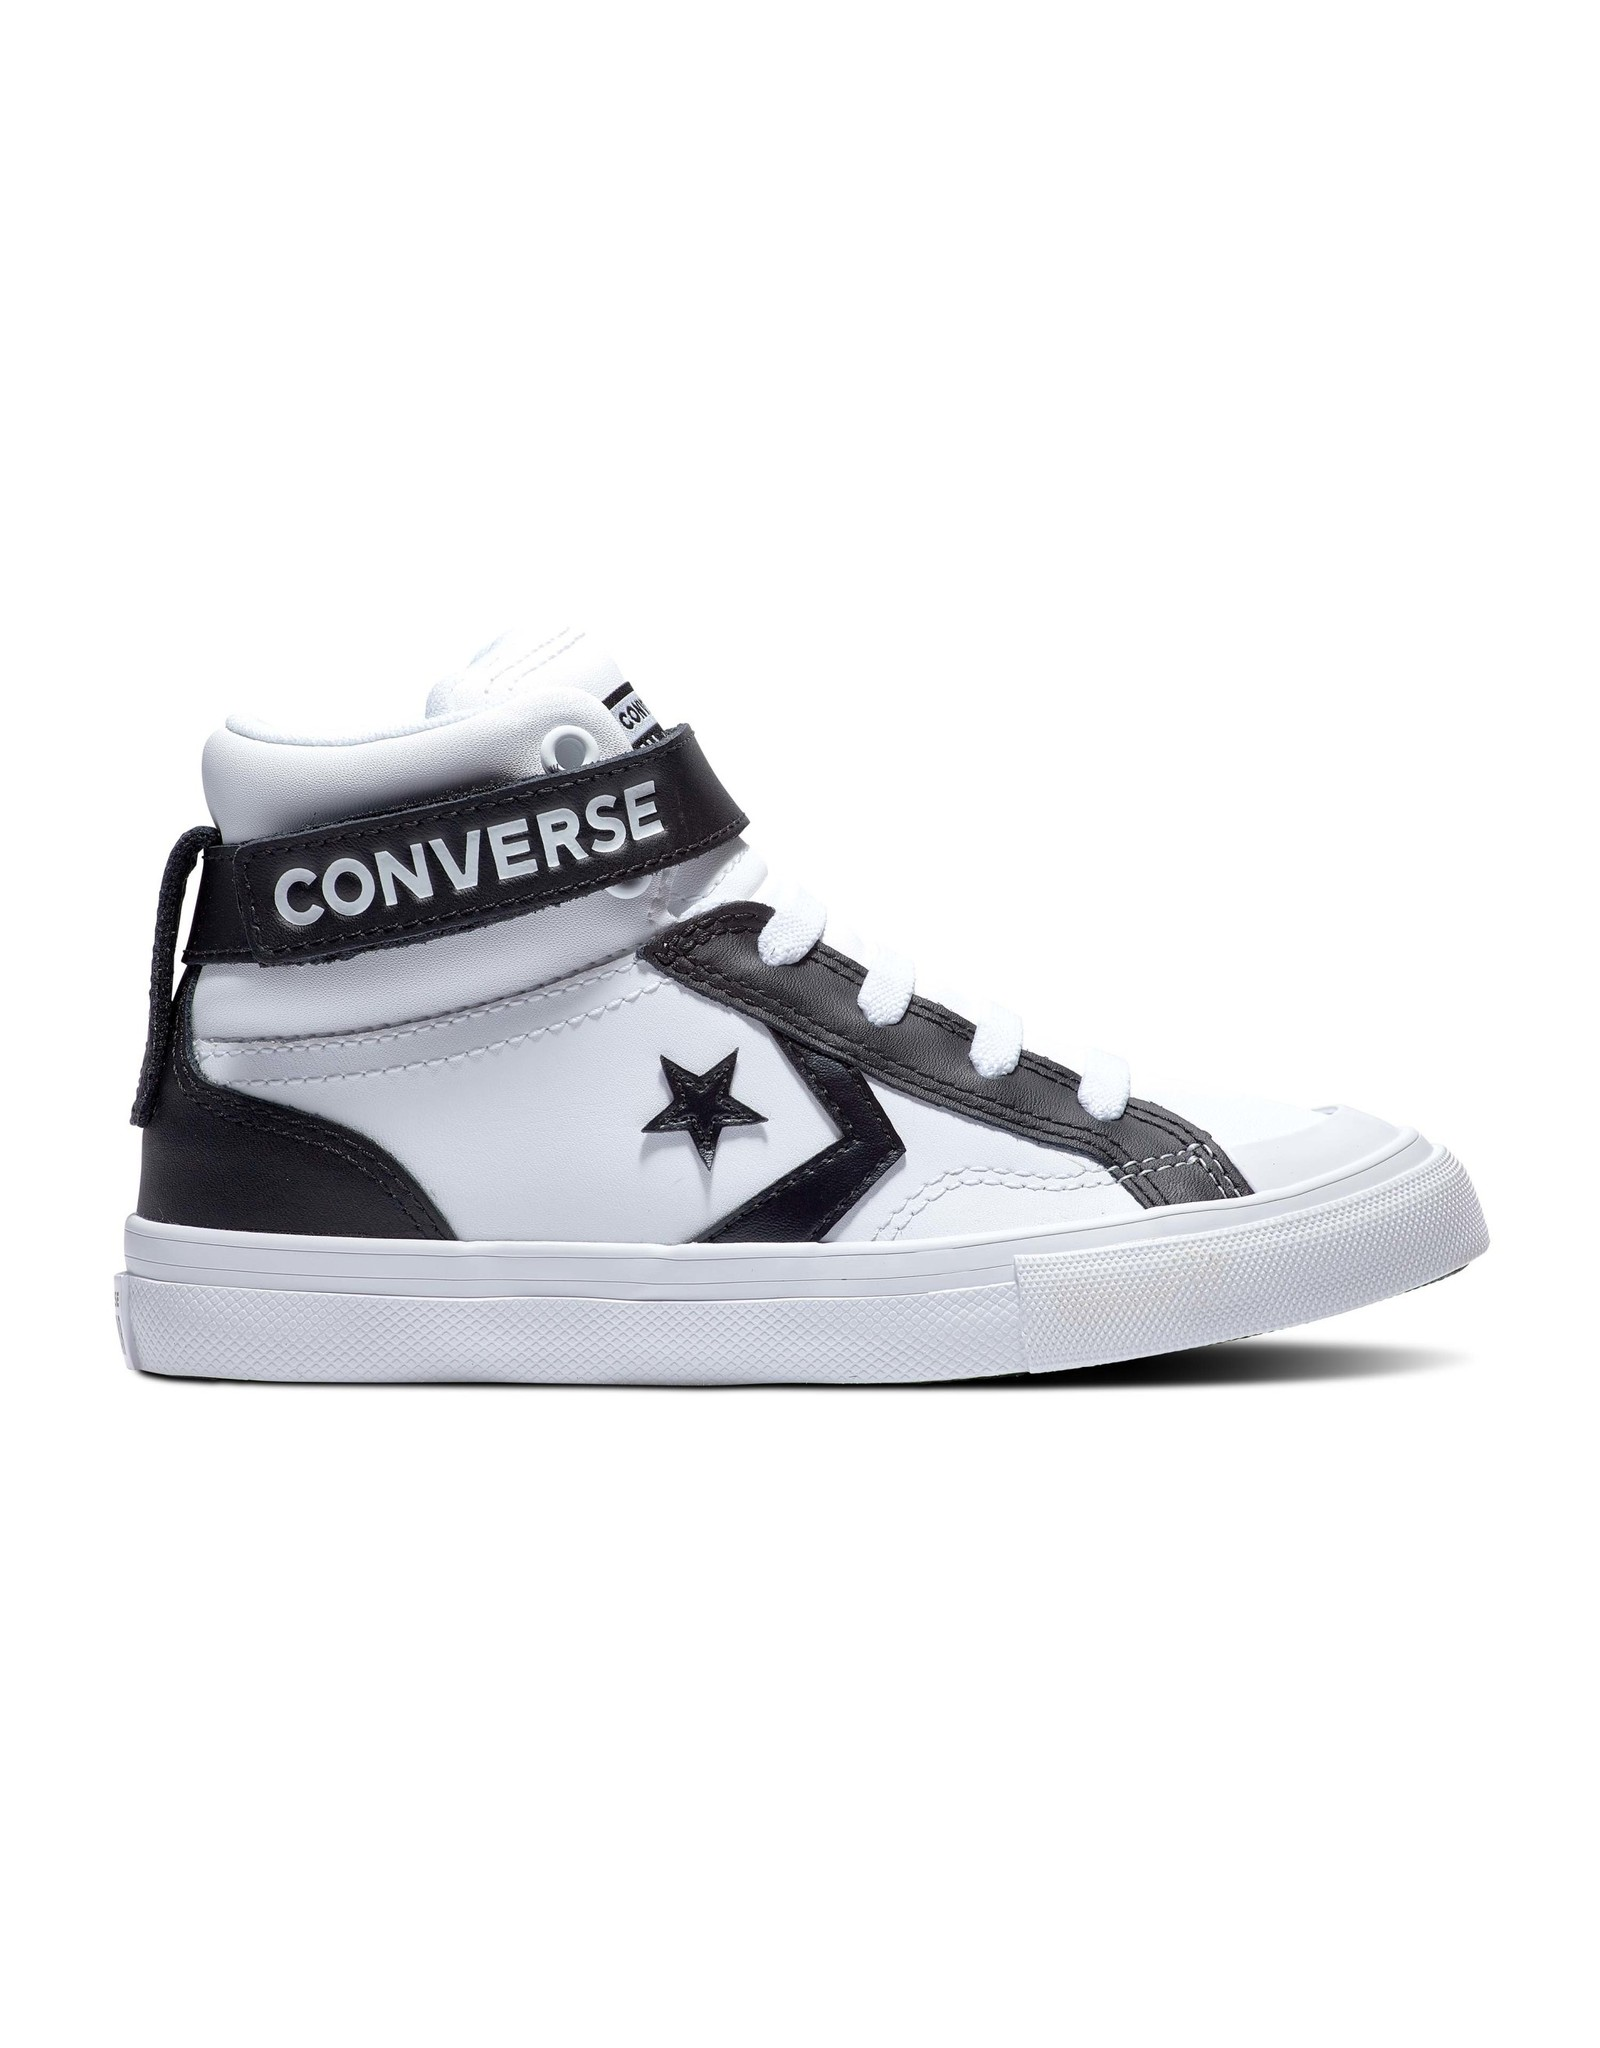 CONVERSE PRO BLAZE HI WHITE/BLACK/WHITE CCB98W-671530C